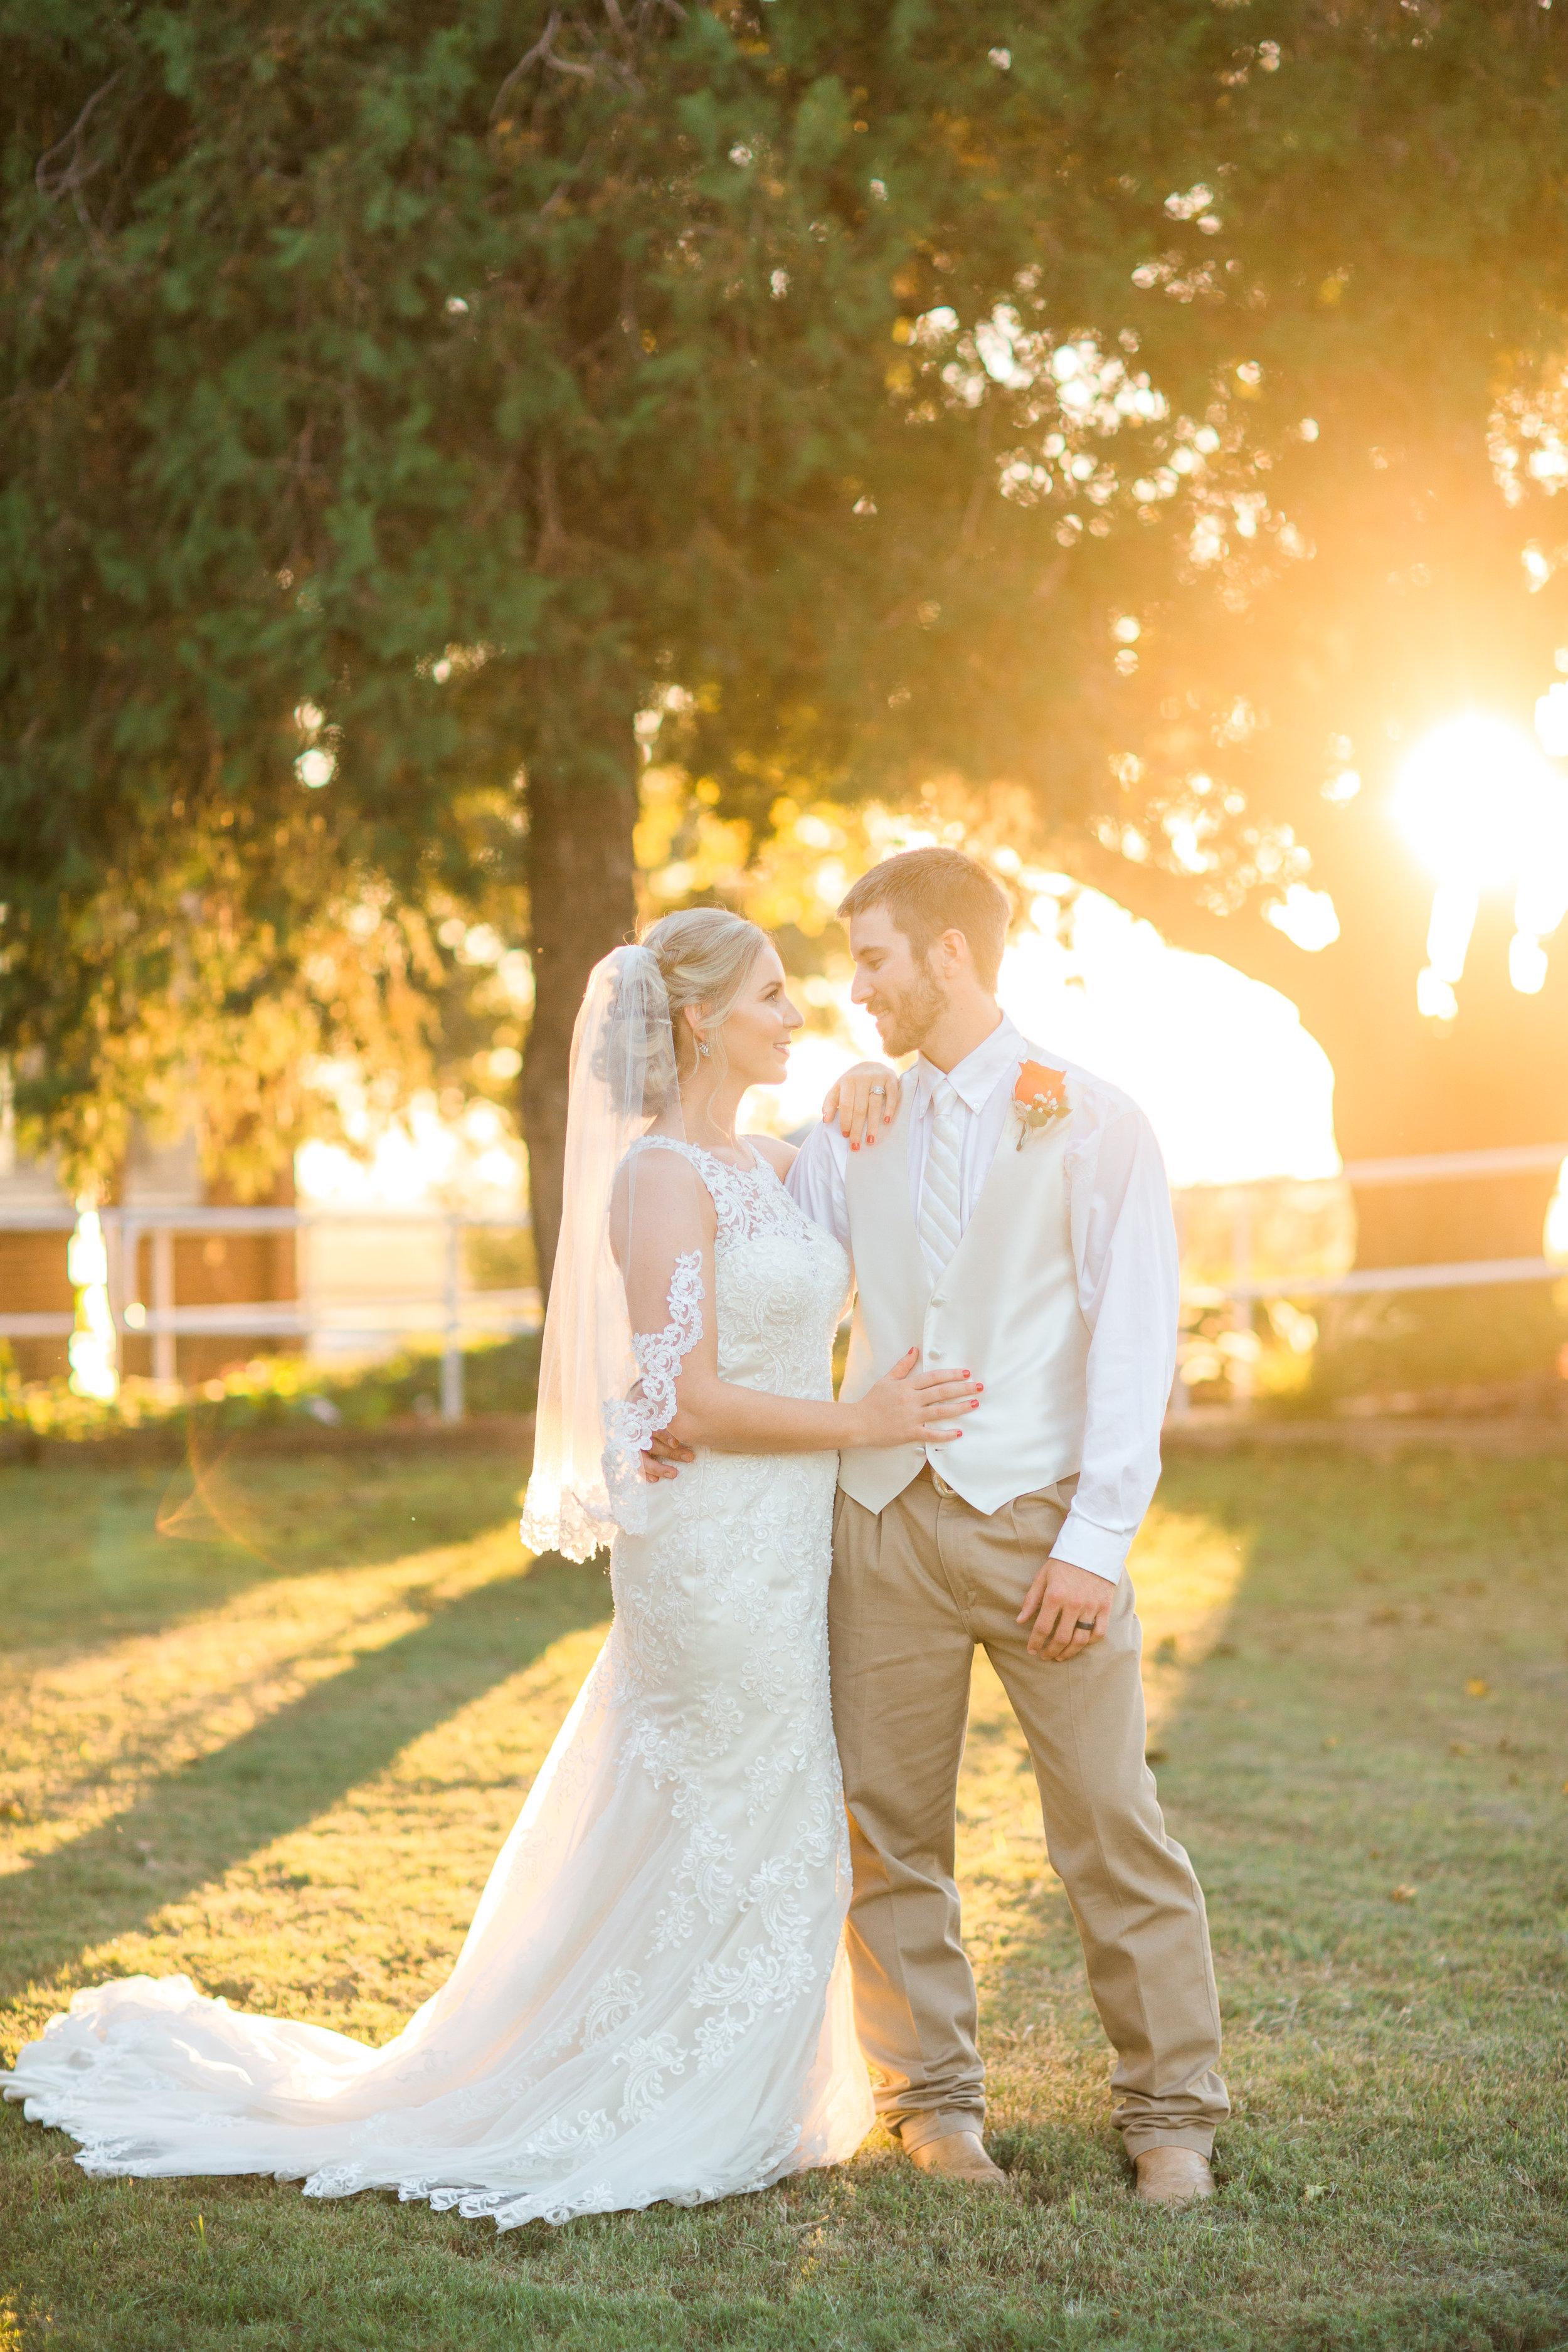 Bailey-Nathan-Windthorst-Texas-Wedding-054.jpg